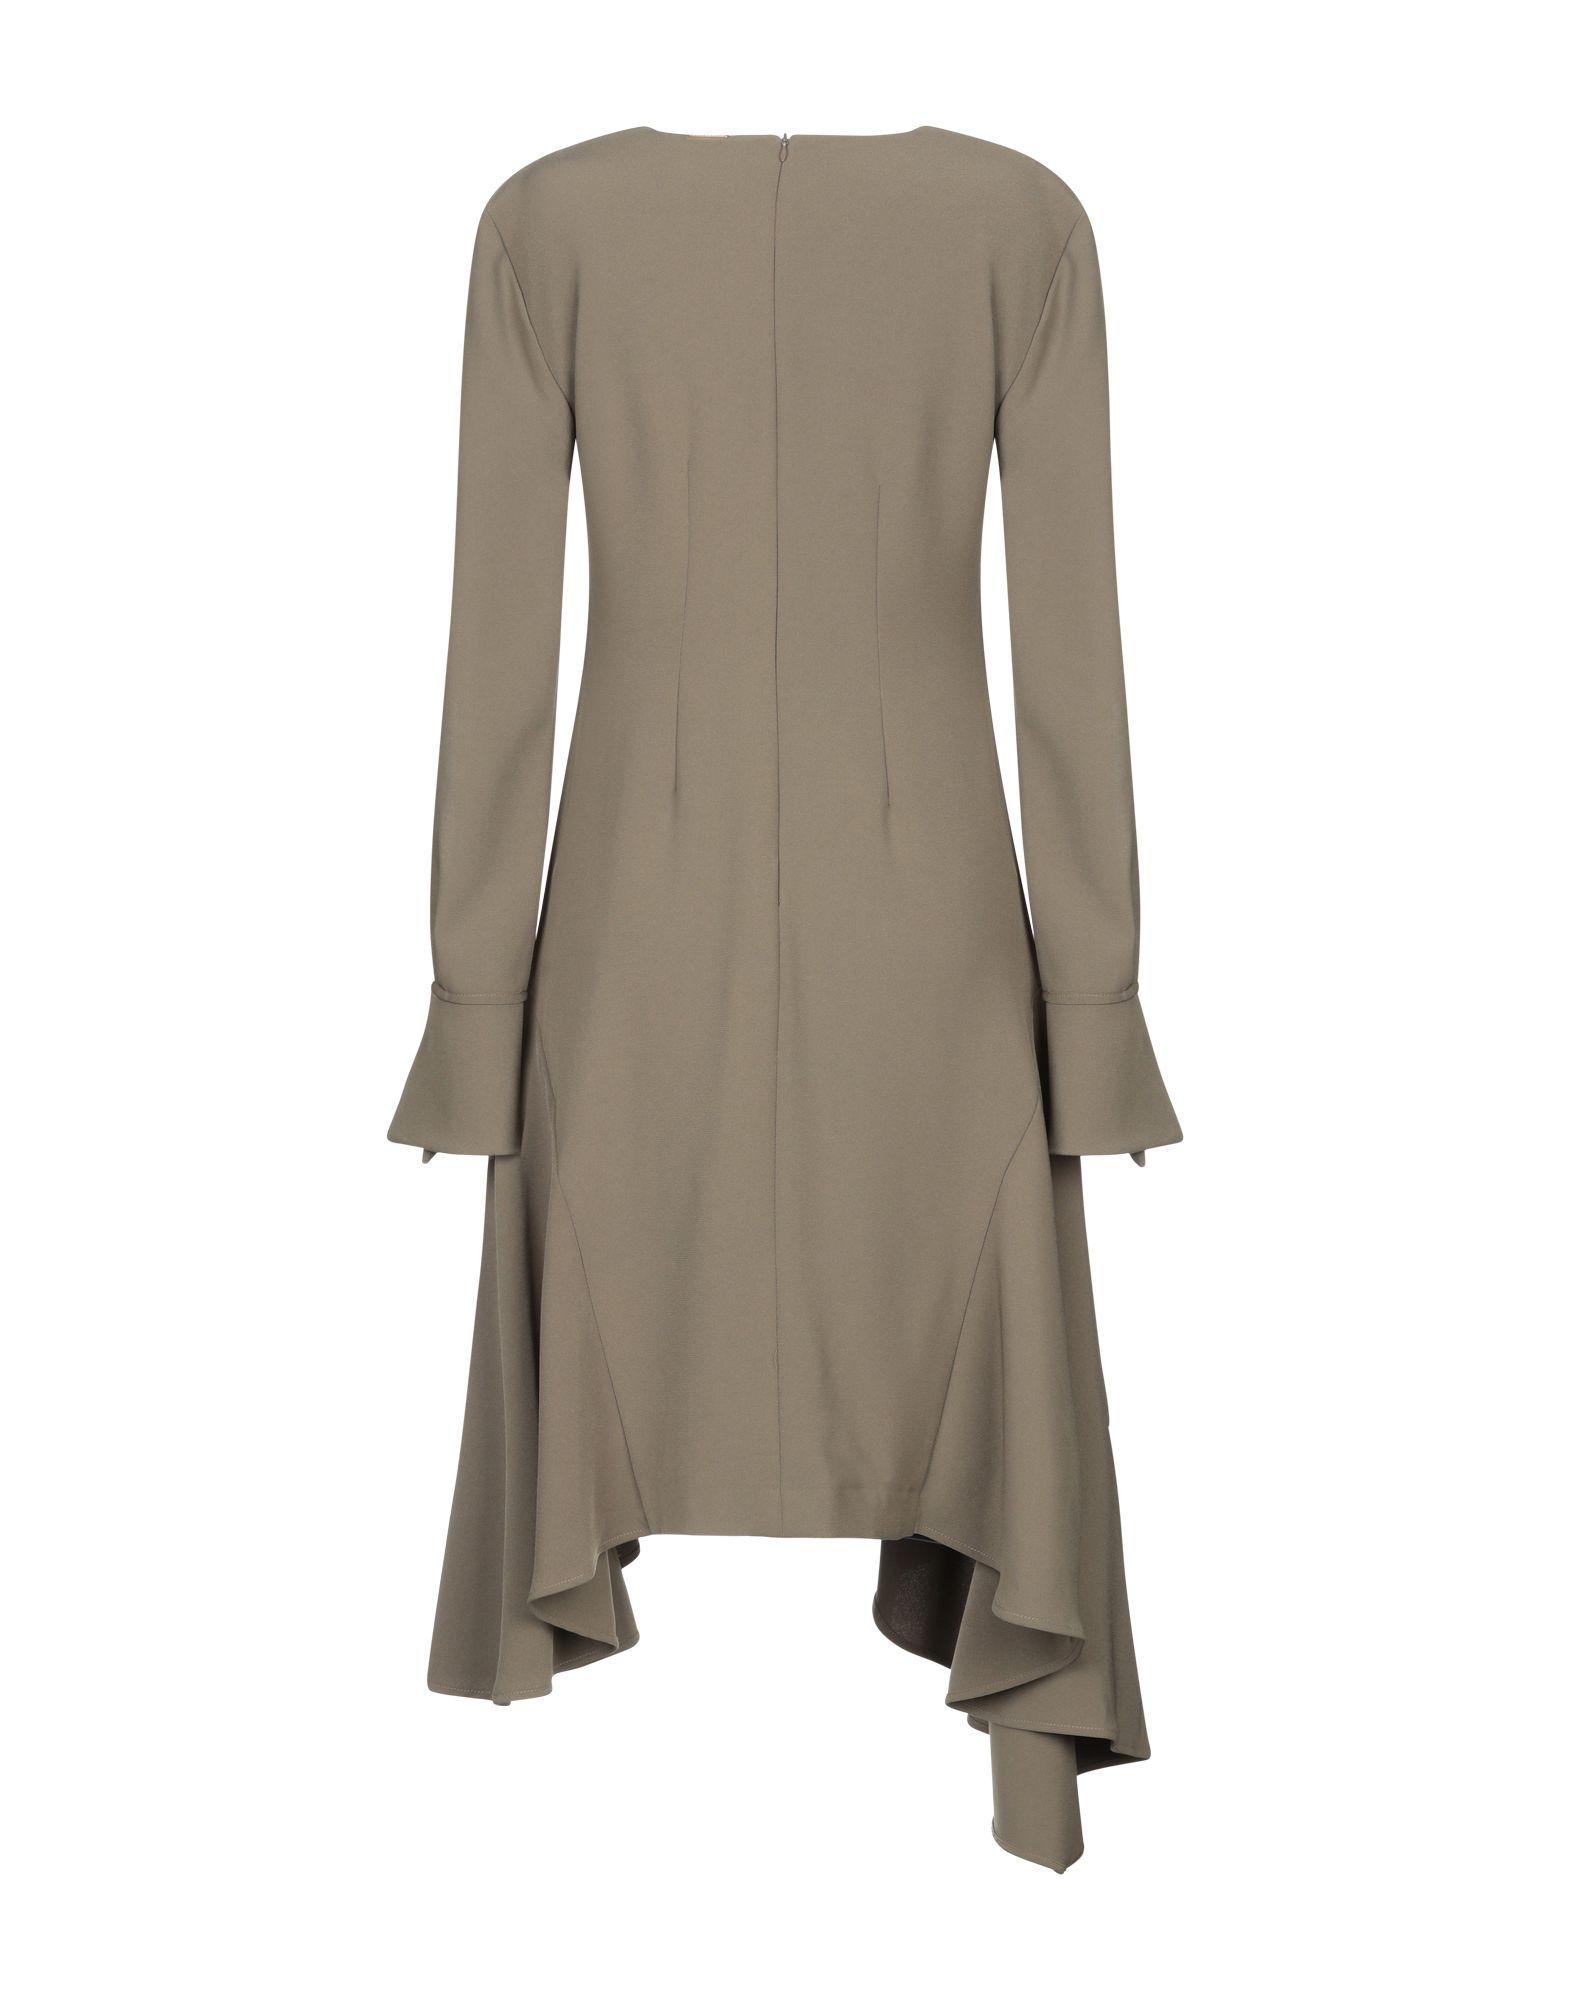 Annarita N Twenty 4H Military Green Crepe Long Sleeve Dress